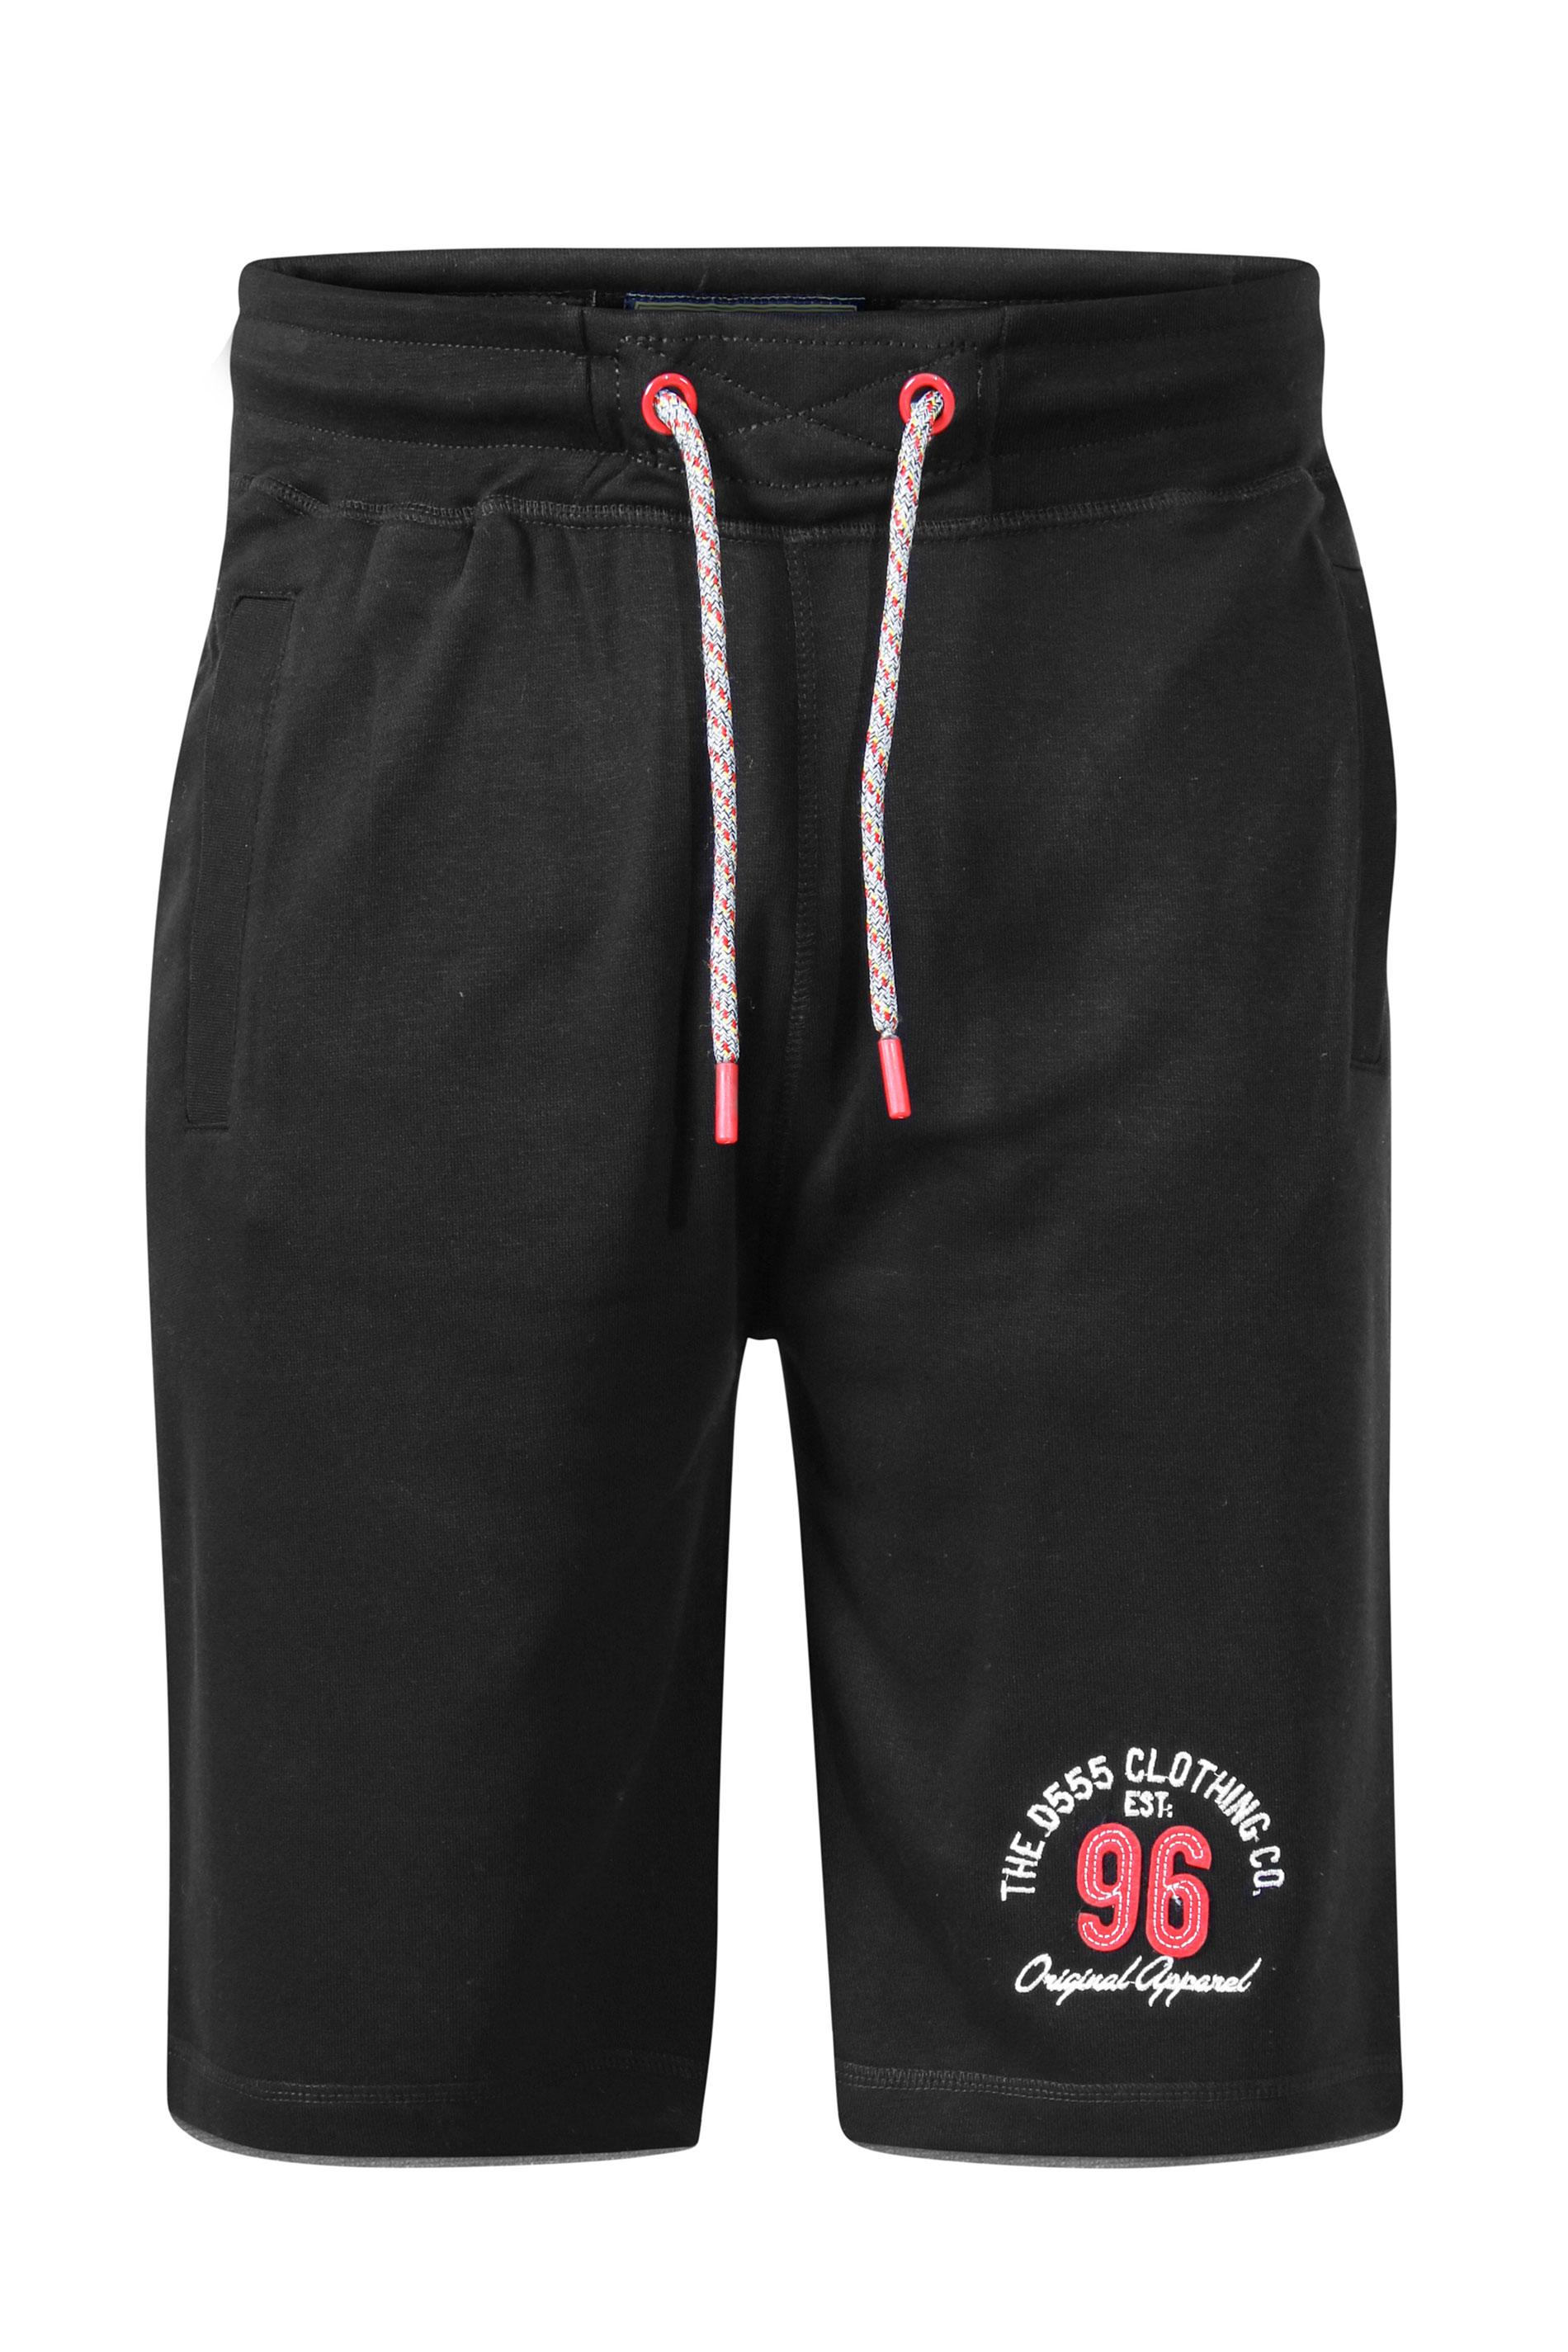 D555 Black Elasticated Waist Shorts